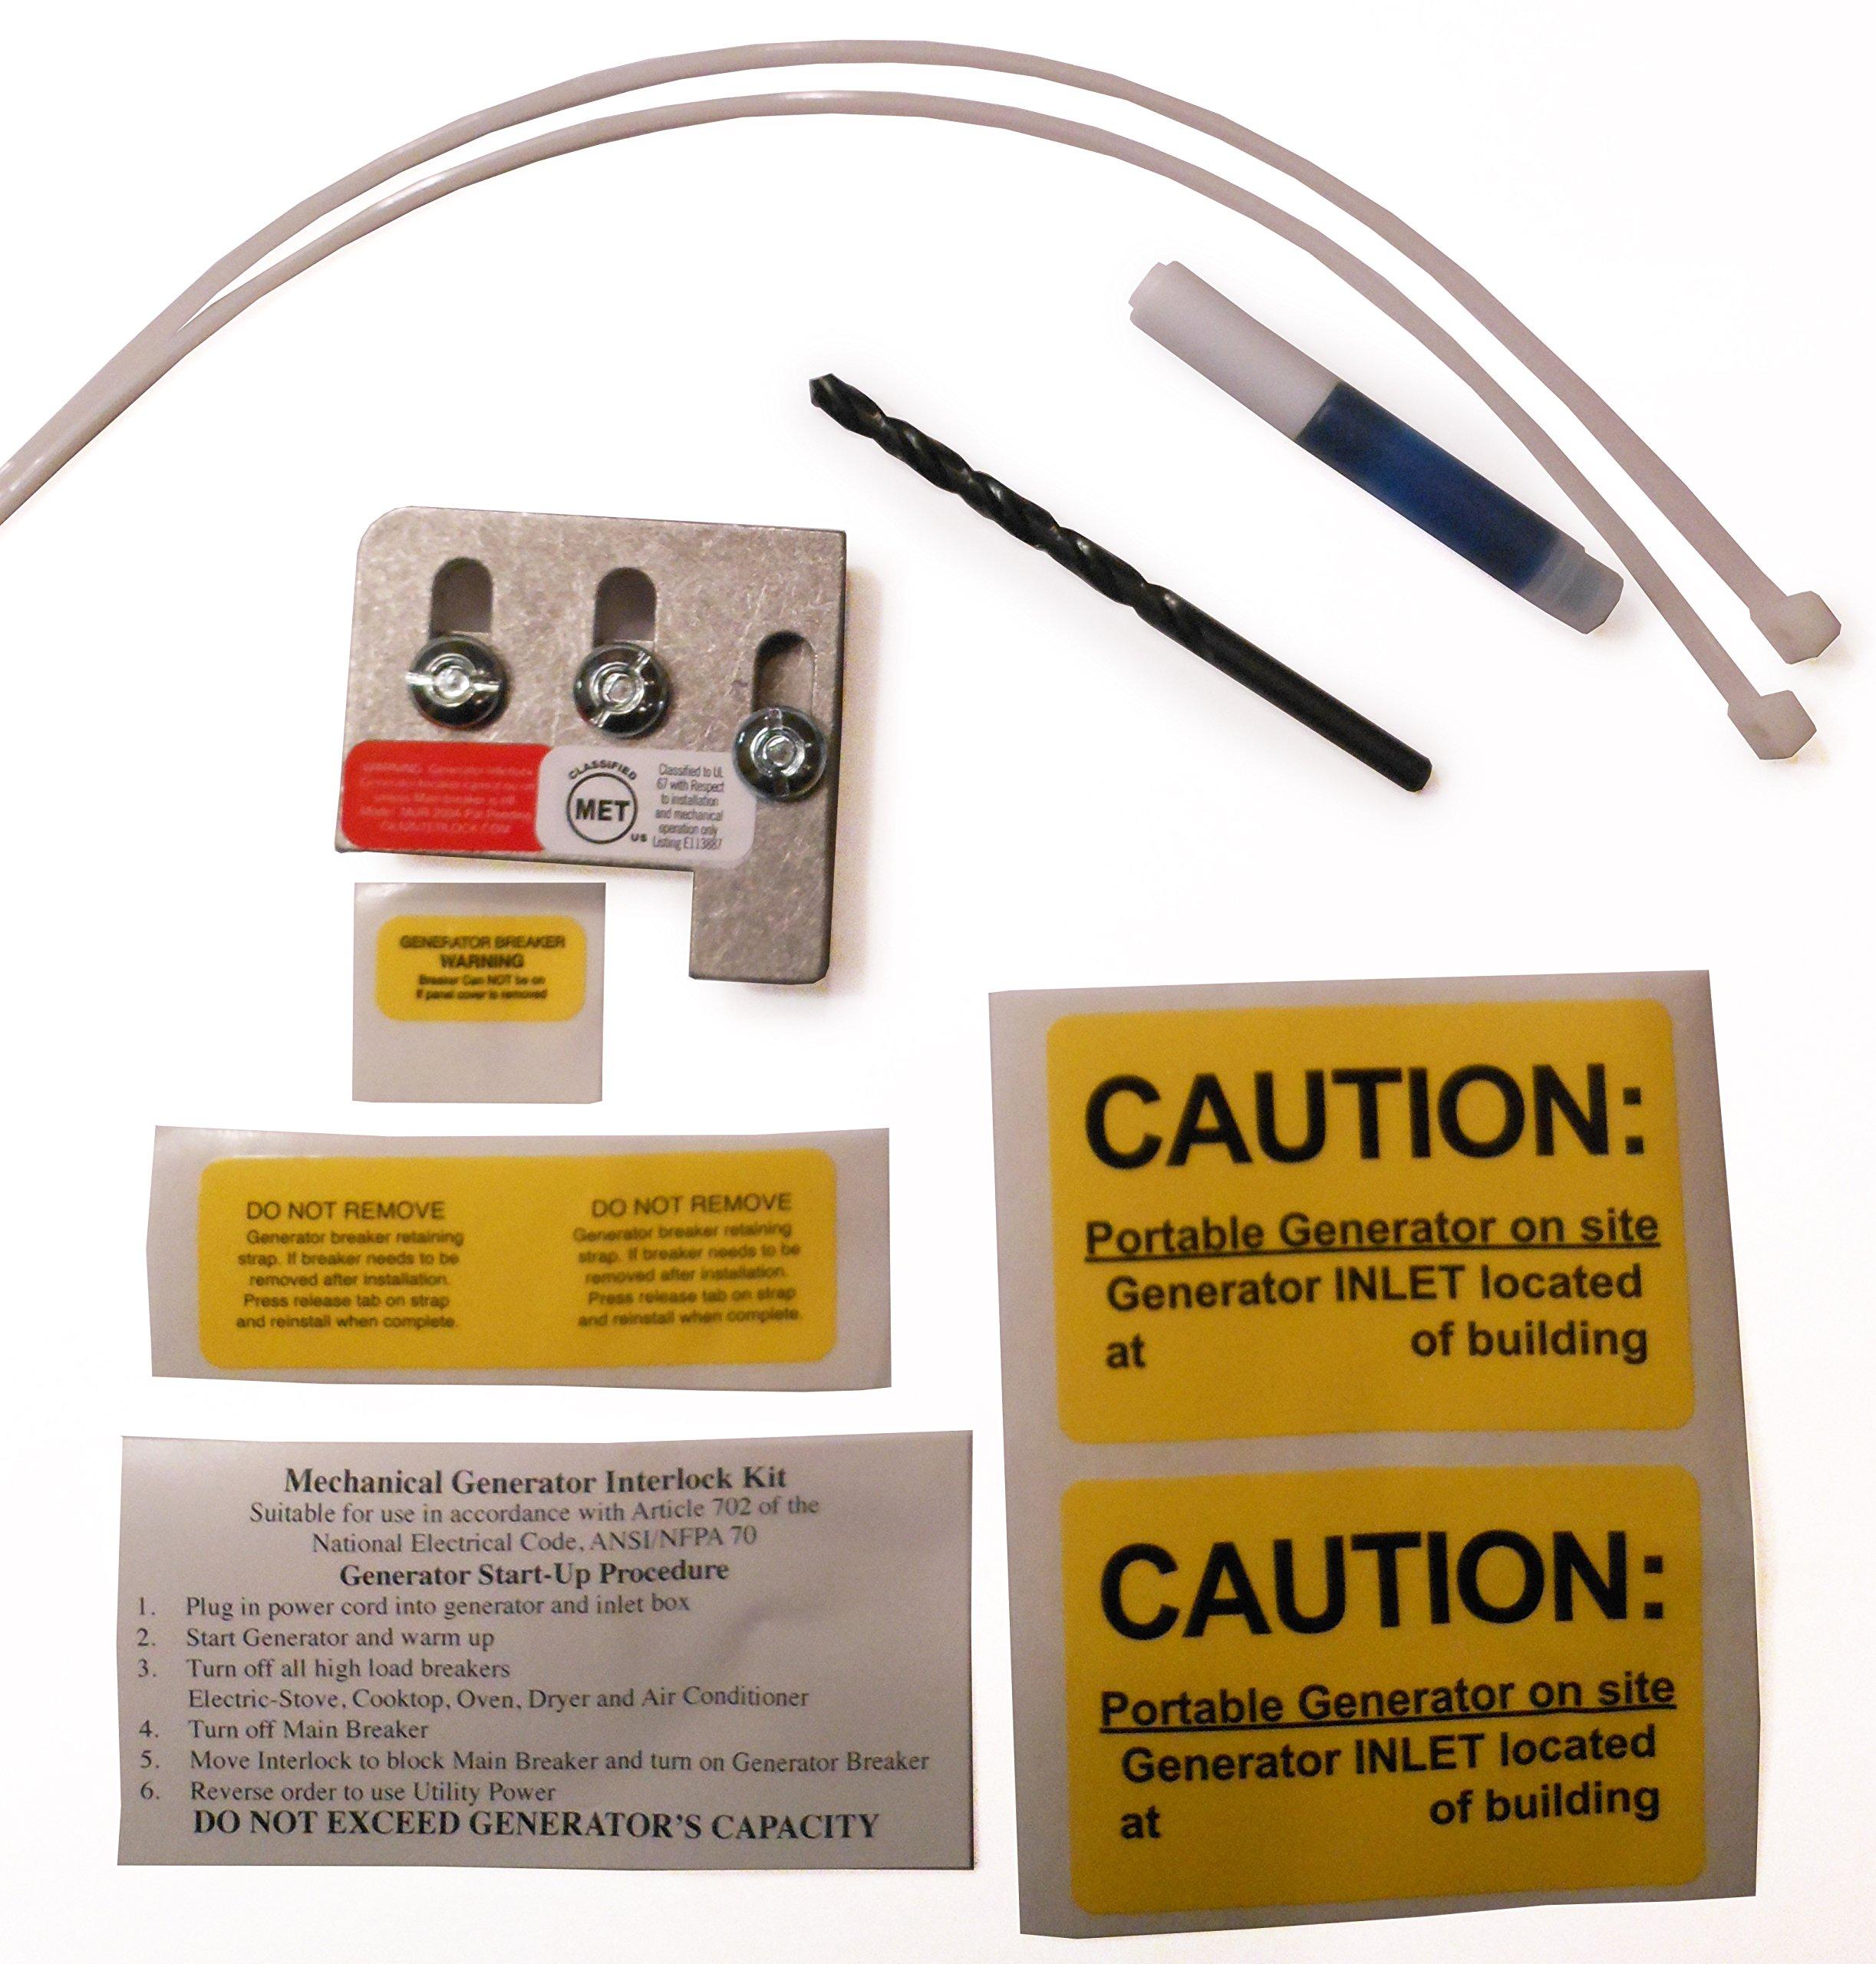 generator interlock amazon com Electrical Outlet Box mur 200a murray or siemens generator interlock kit 150 amp or 200 amp panels